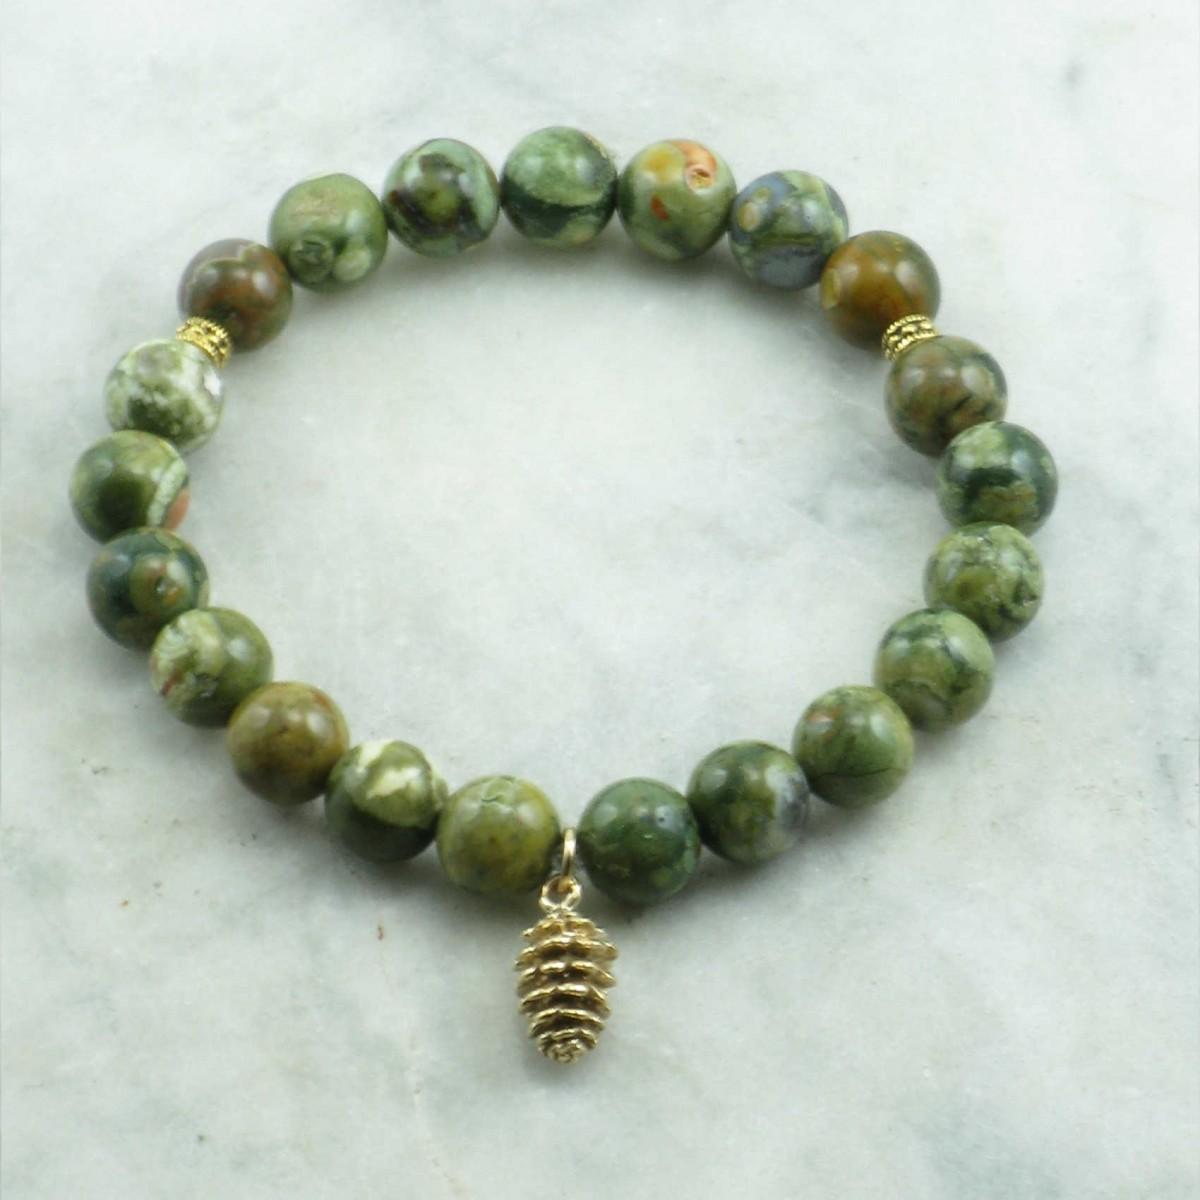 Nature_Mala_Bracelet_21_Rainforest_Jasper _Mala_Beads_Buddhist_Bracelet